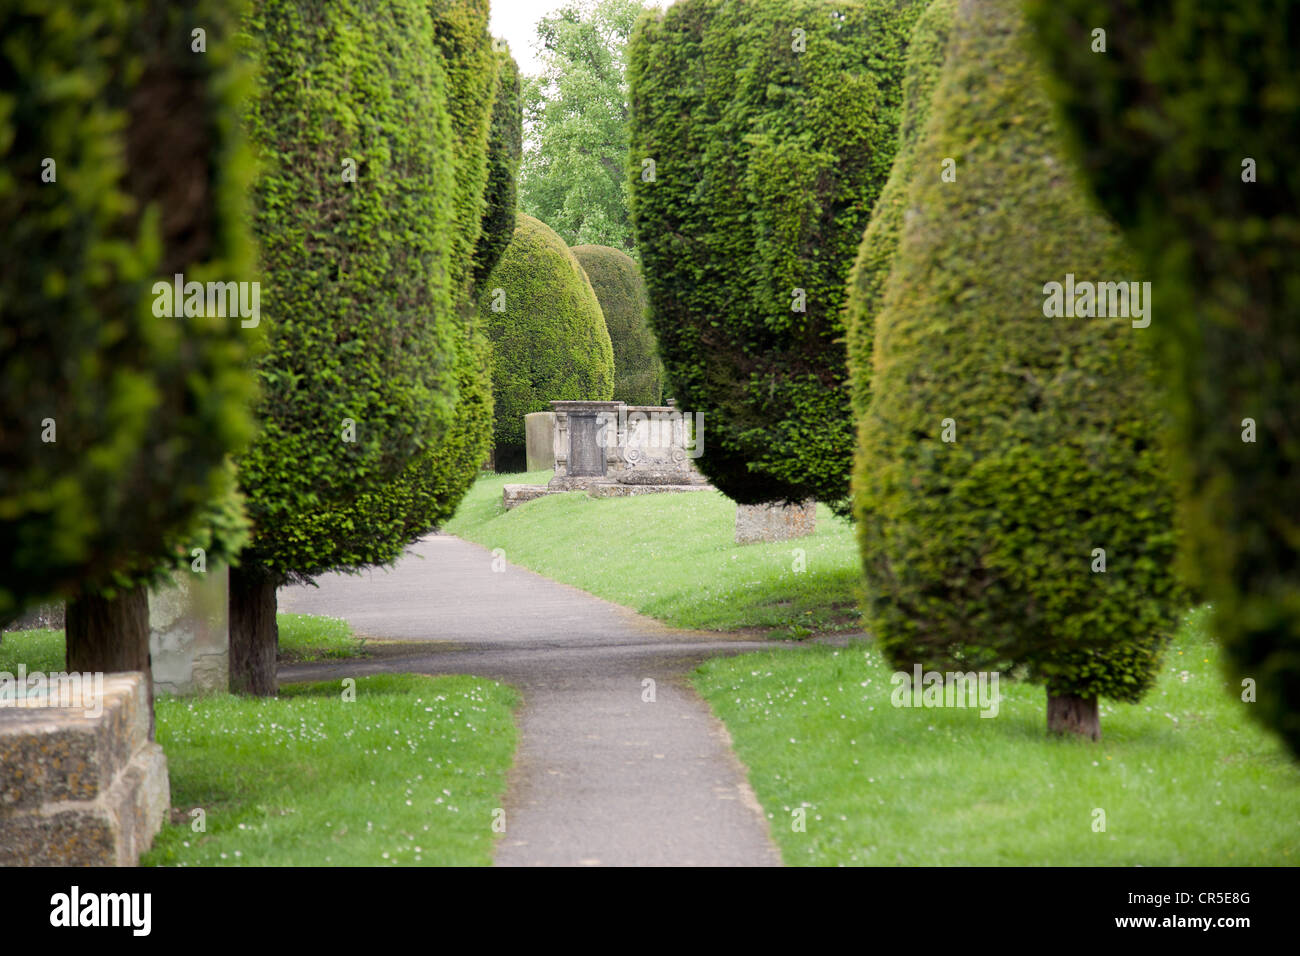 Yew trees St Marys Church, Painswick, Stroud, Gloucestershire - Stock Image